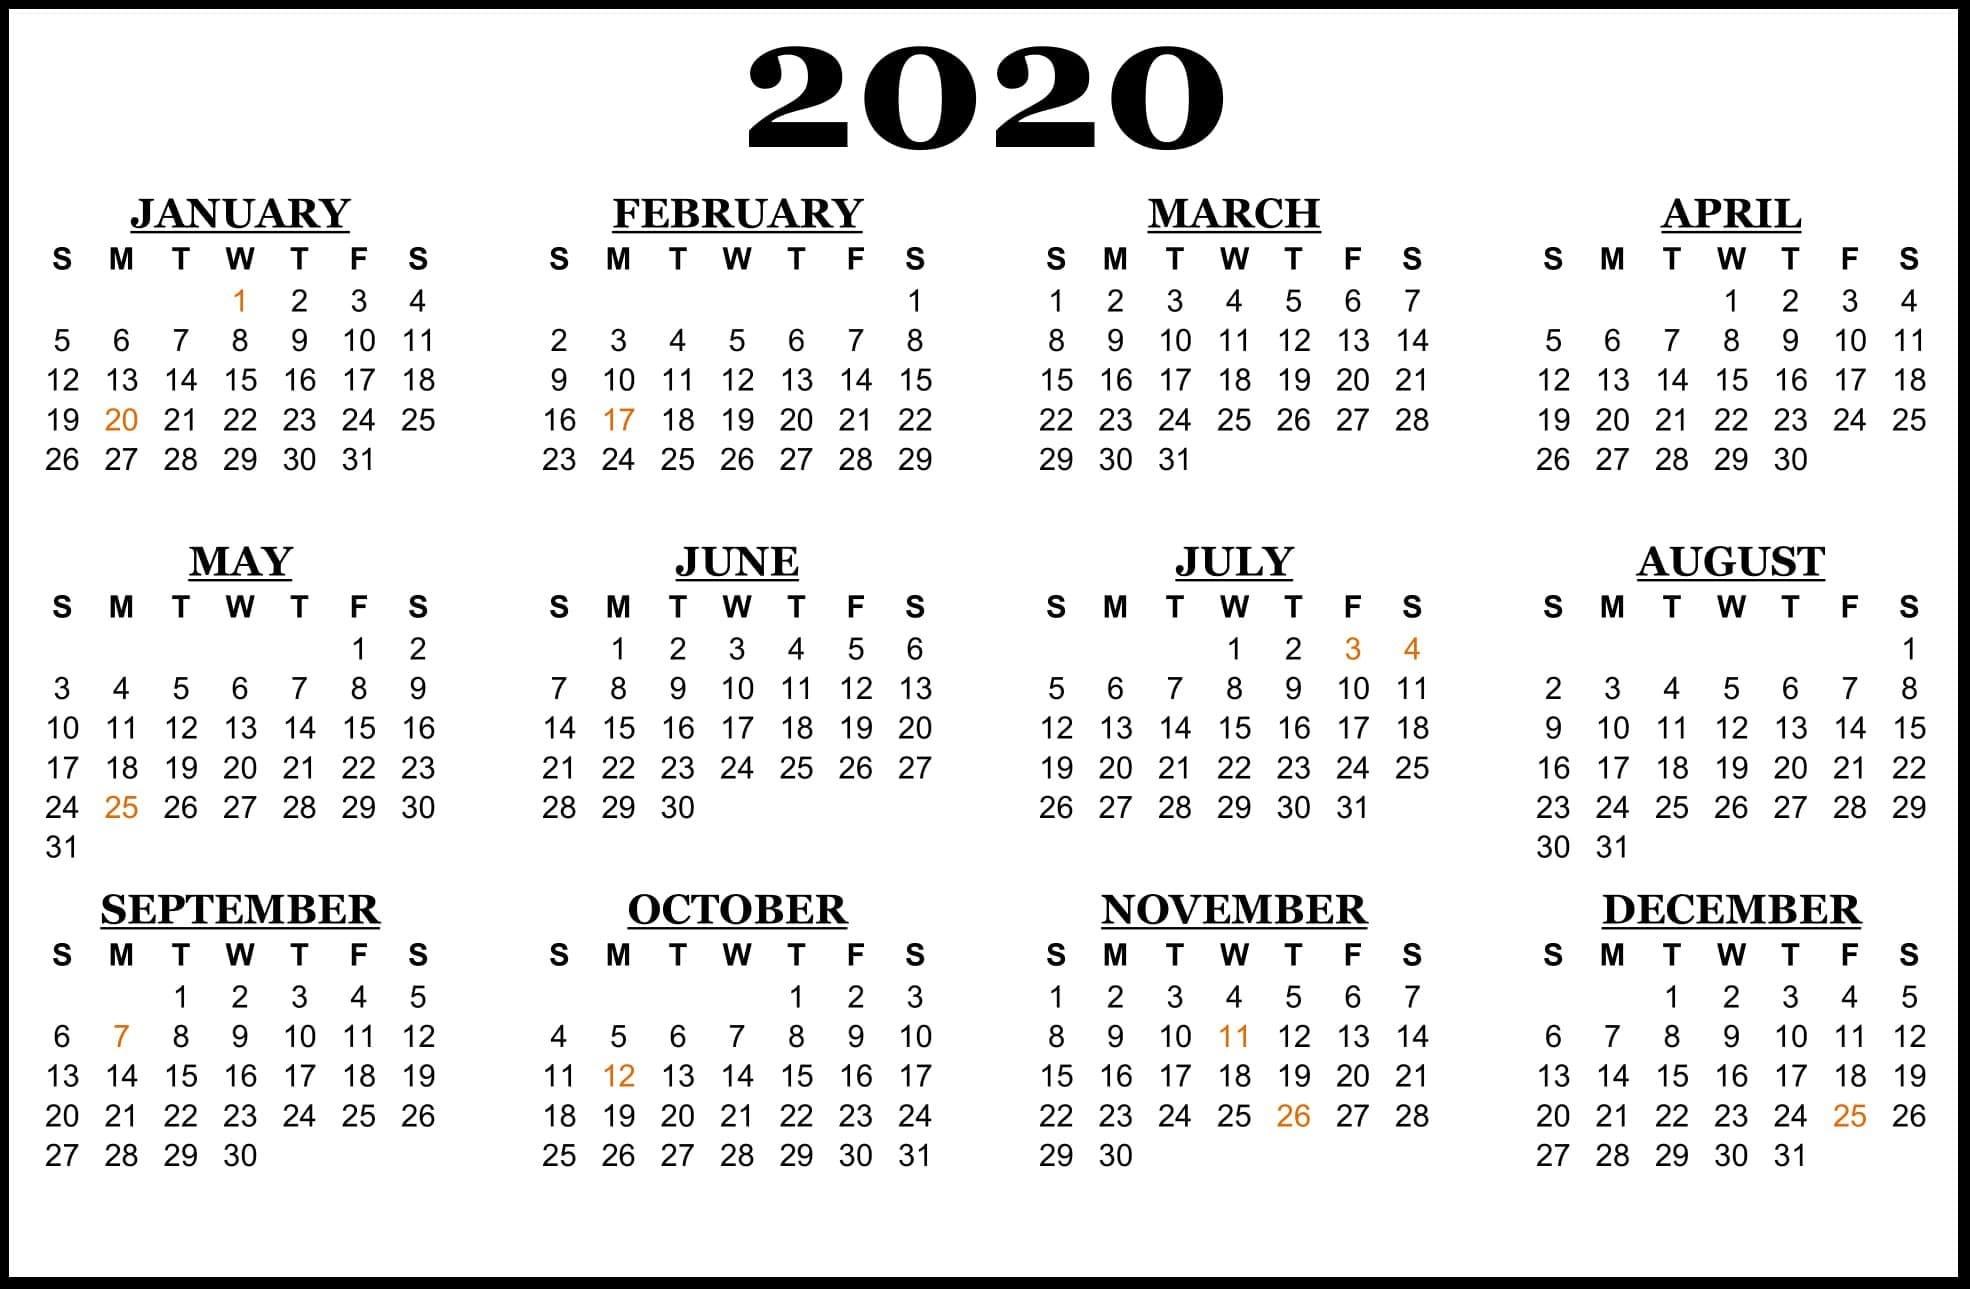 2020-Calendar-Us-Holidays-S A Public Holidays 2020